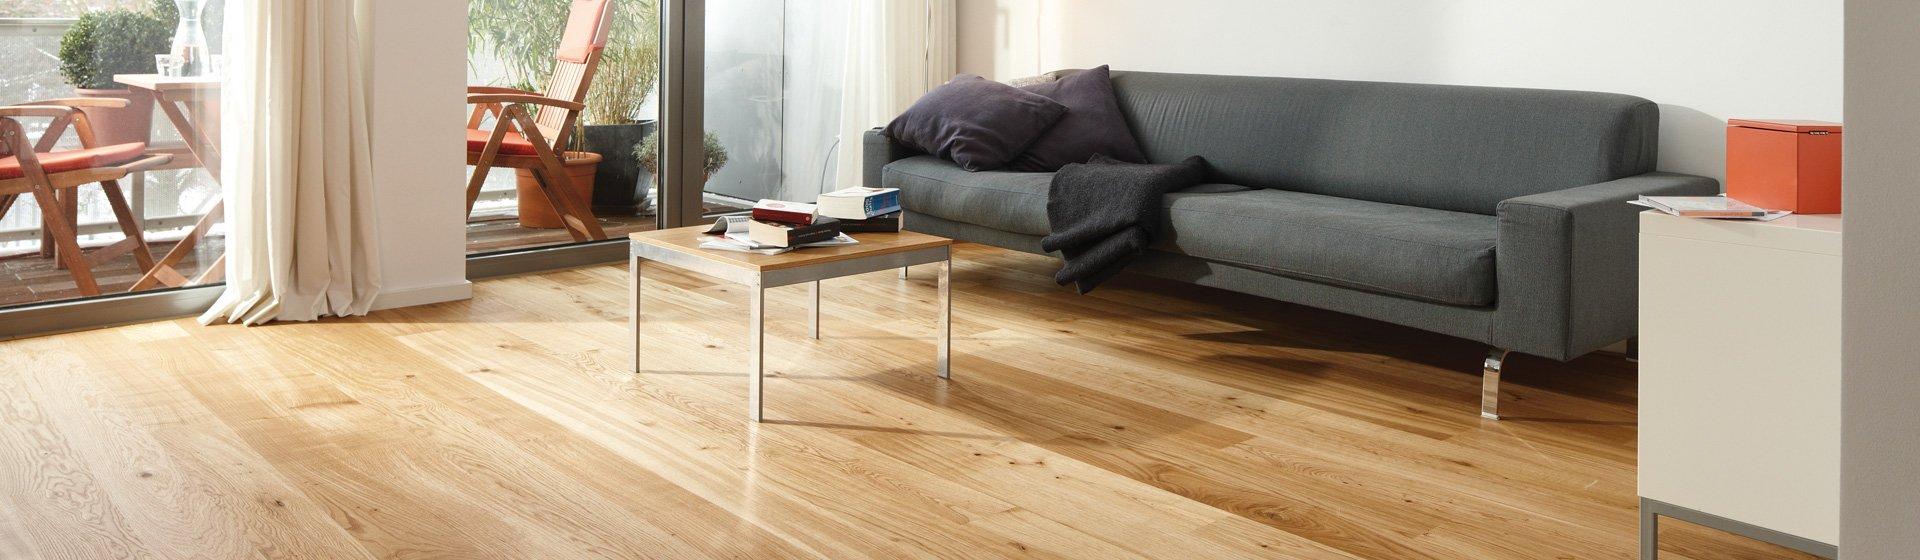 Curiosità pavimenti in legno